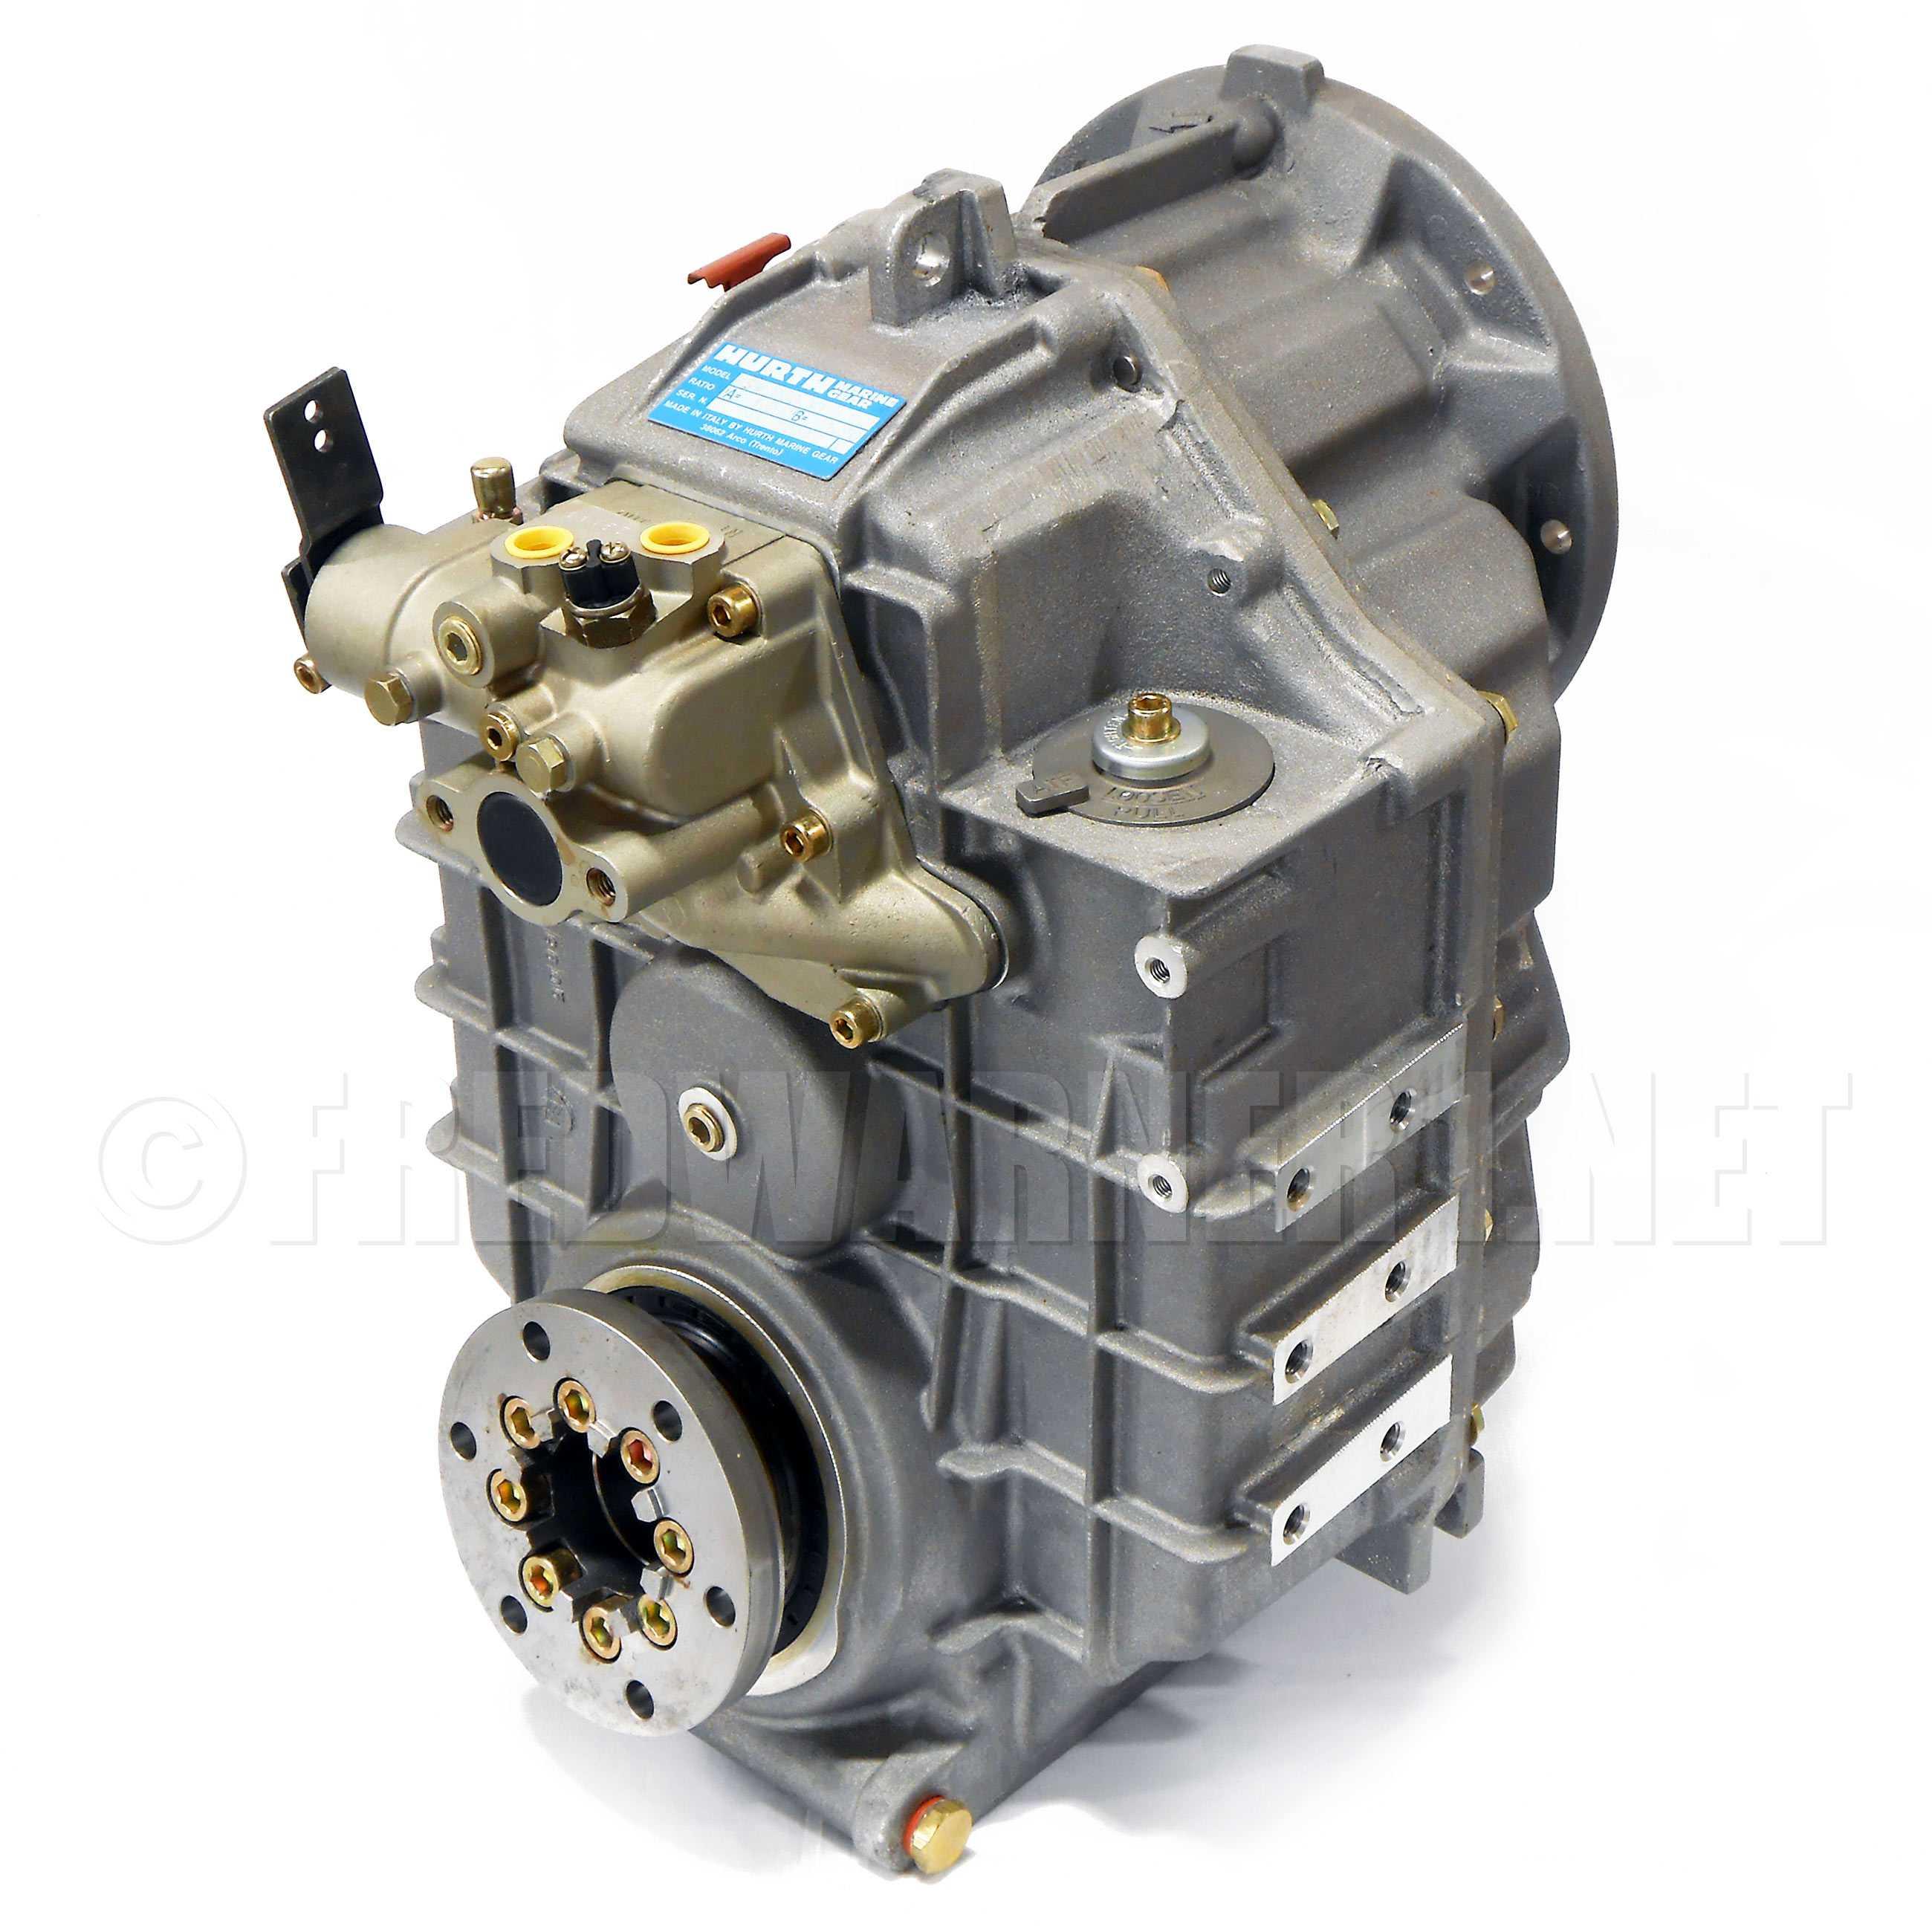 hurth hsw 800 v1 1 2 1 marine boat transmission v drive rh fredwarner1 net hurth 630a transmission manual zf hurth transmission manual